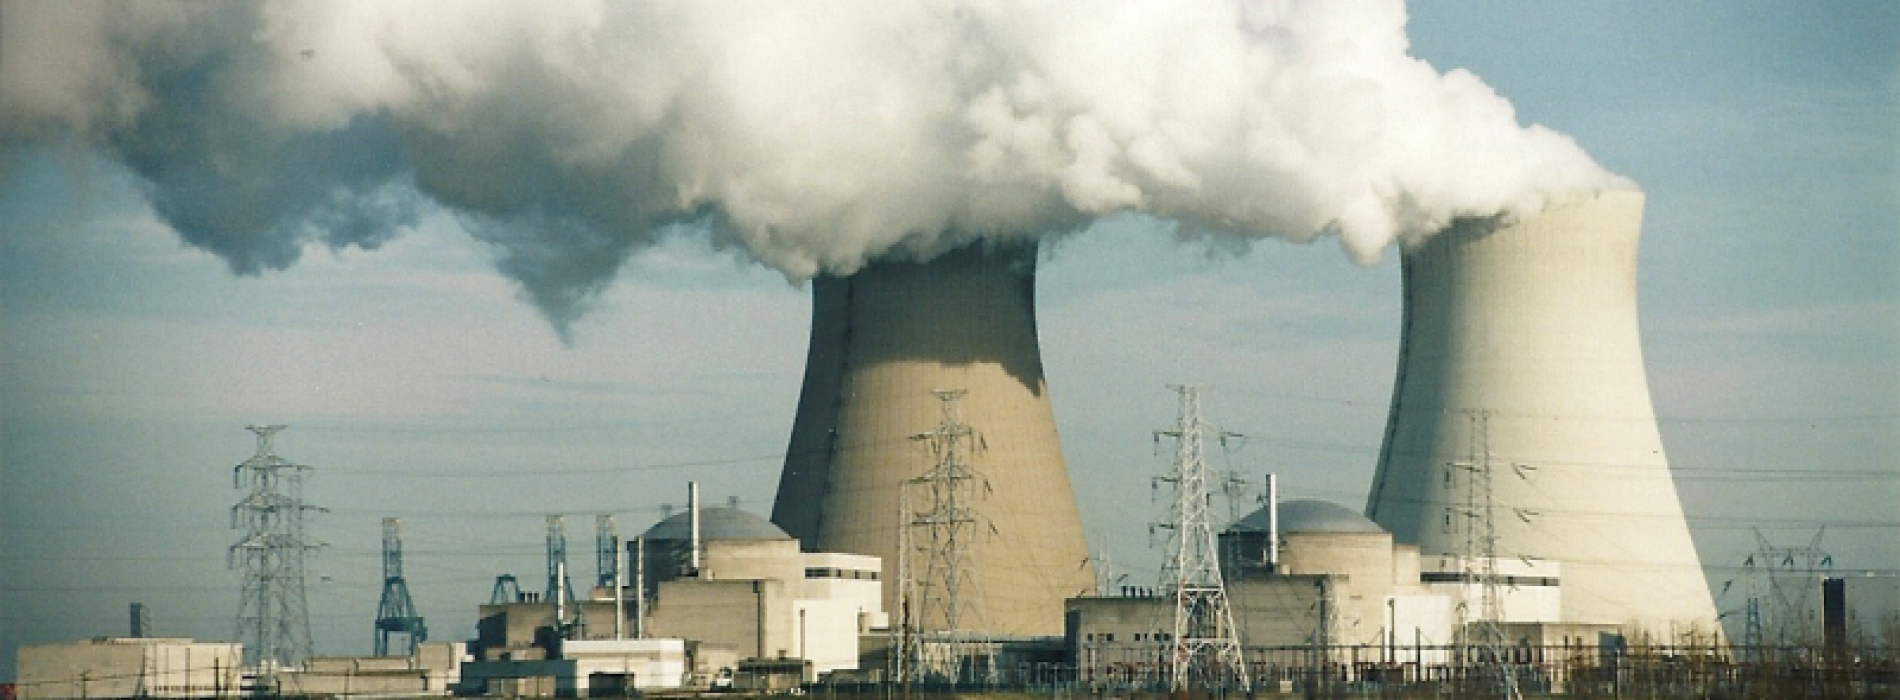 Sud Africa Tender 72 Miliardi di dollari per il nucleare